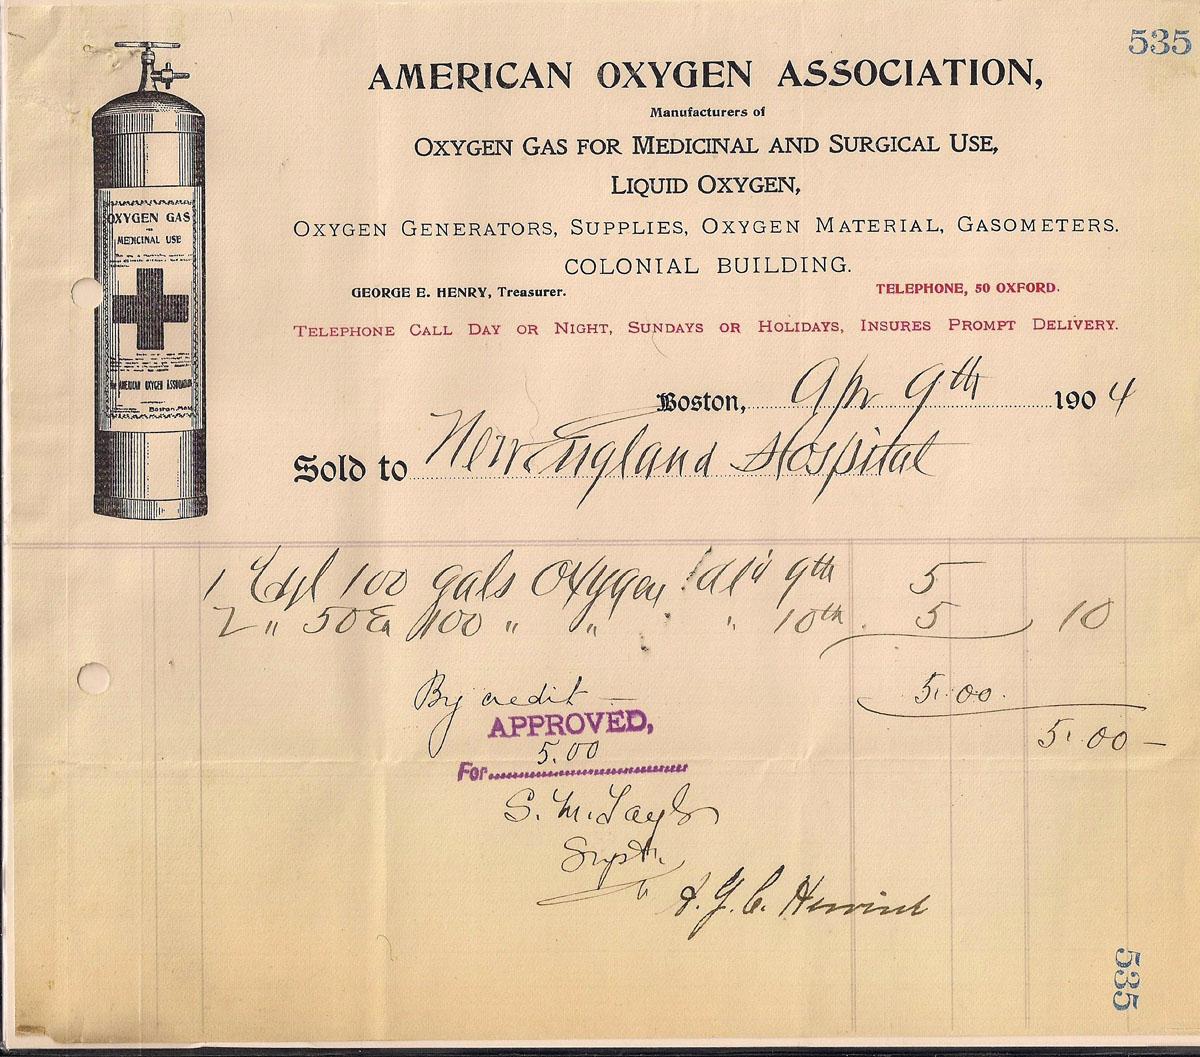 1904 Receipt for Oxygen